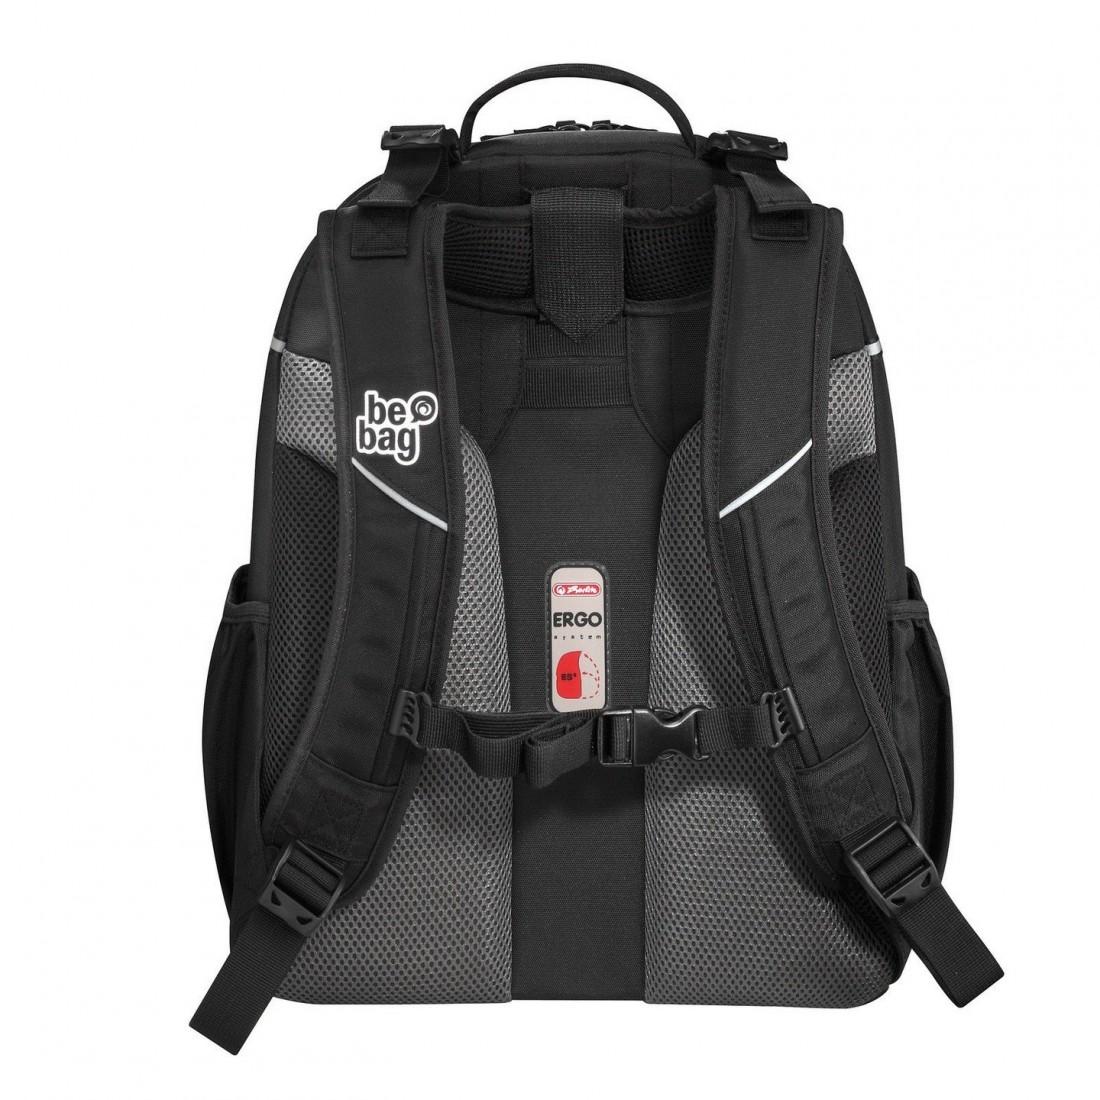 9504f00aed823 Plecak szkolny Herlitz Be.bag Airgo - Feather - czarny w kolorowe piórka  boho - plecak-tornister.pl